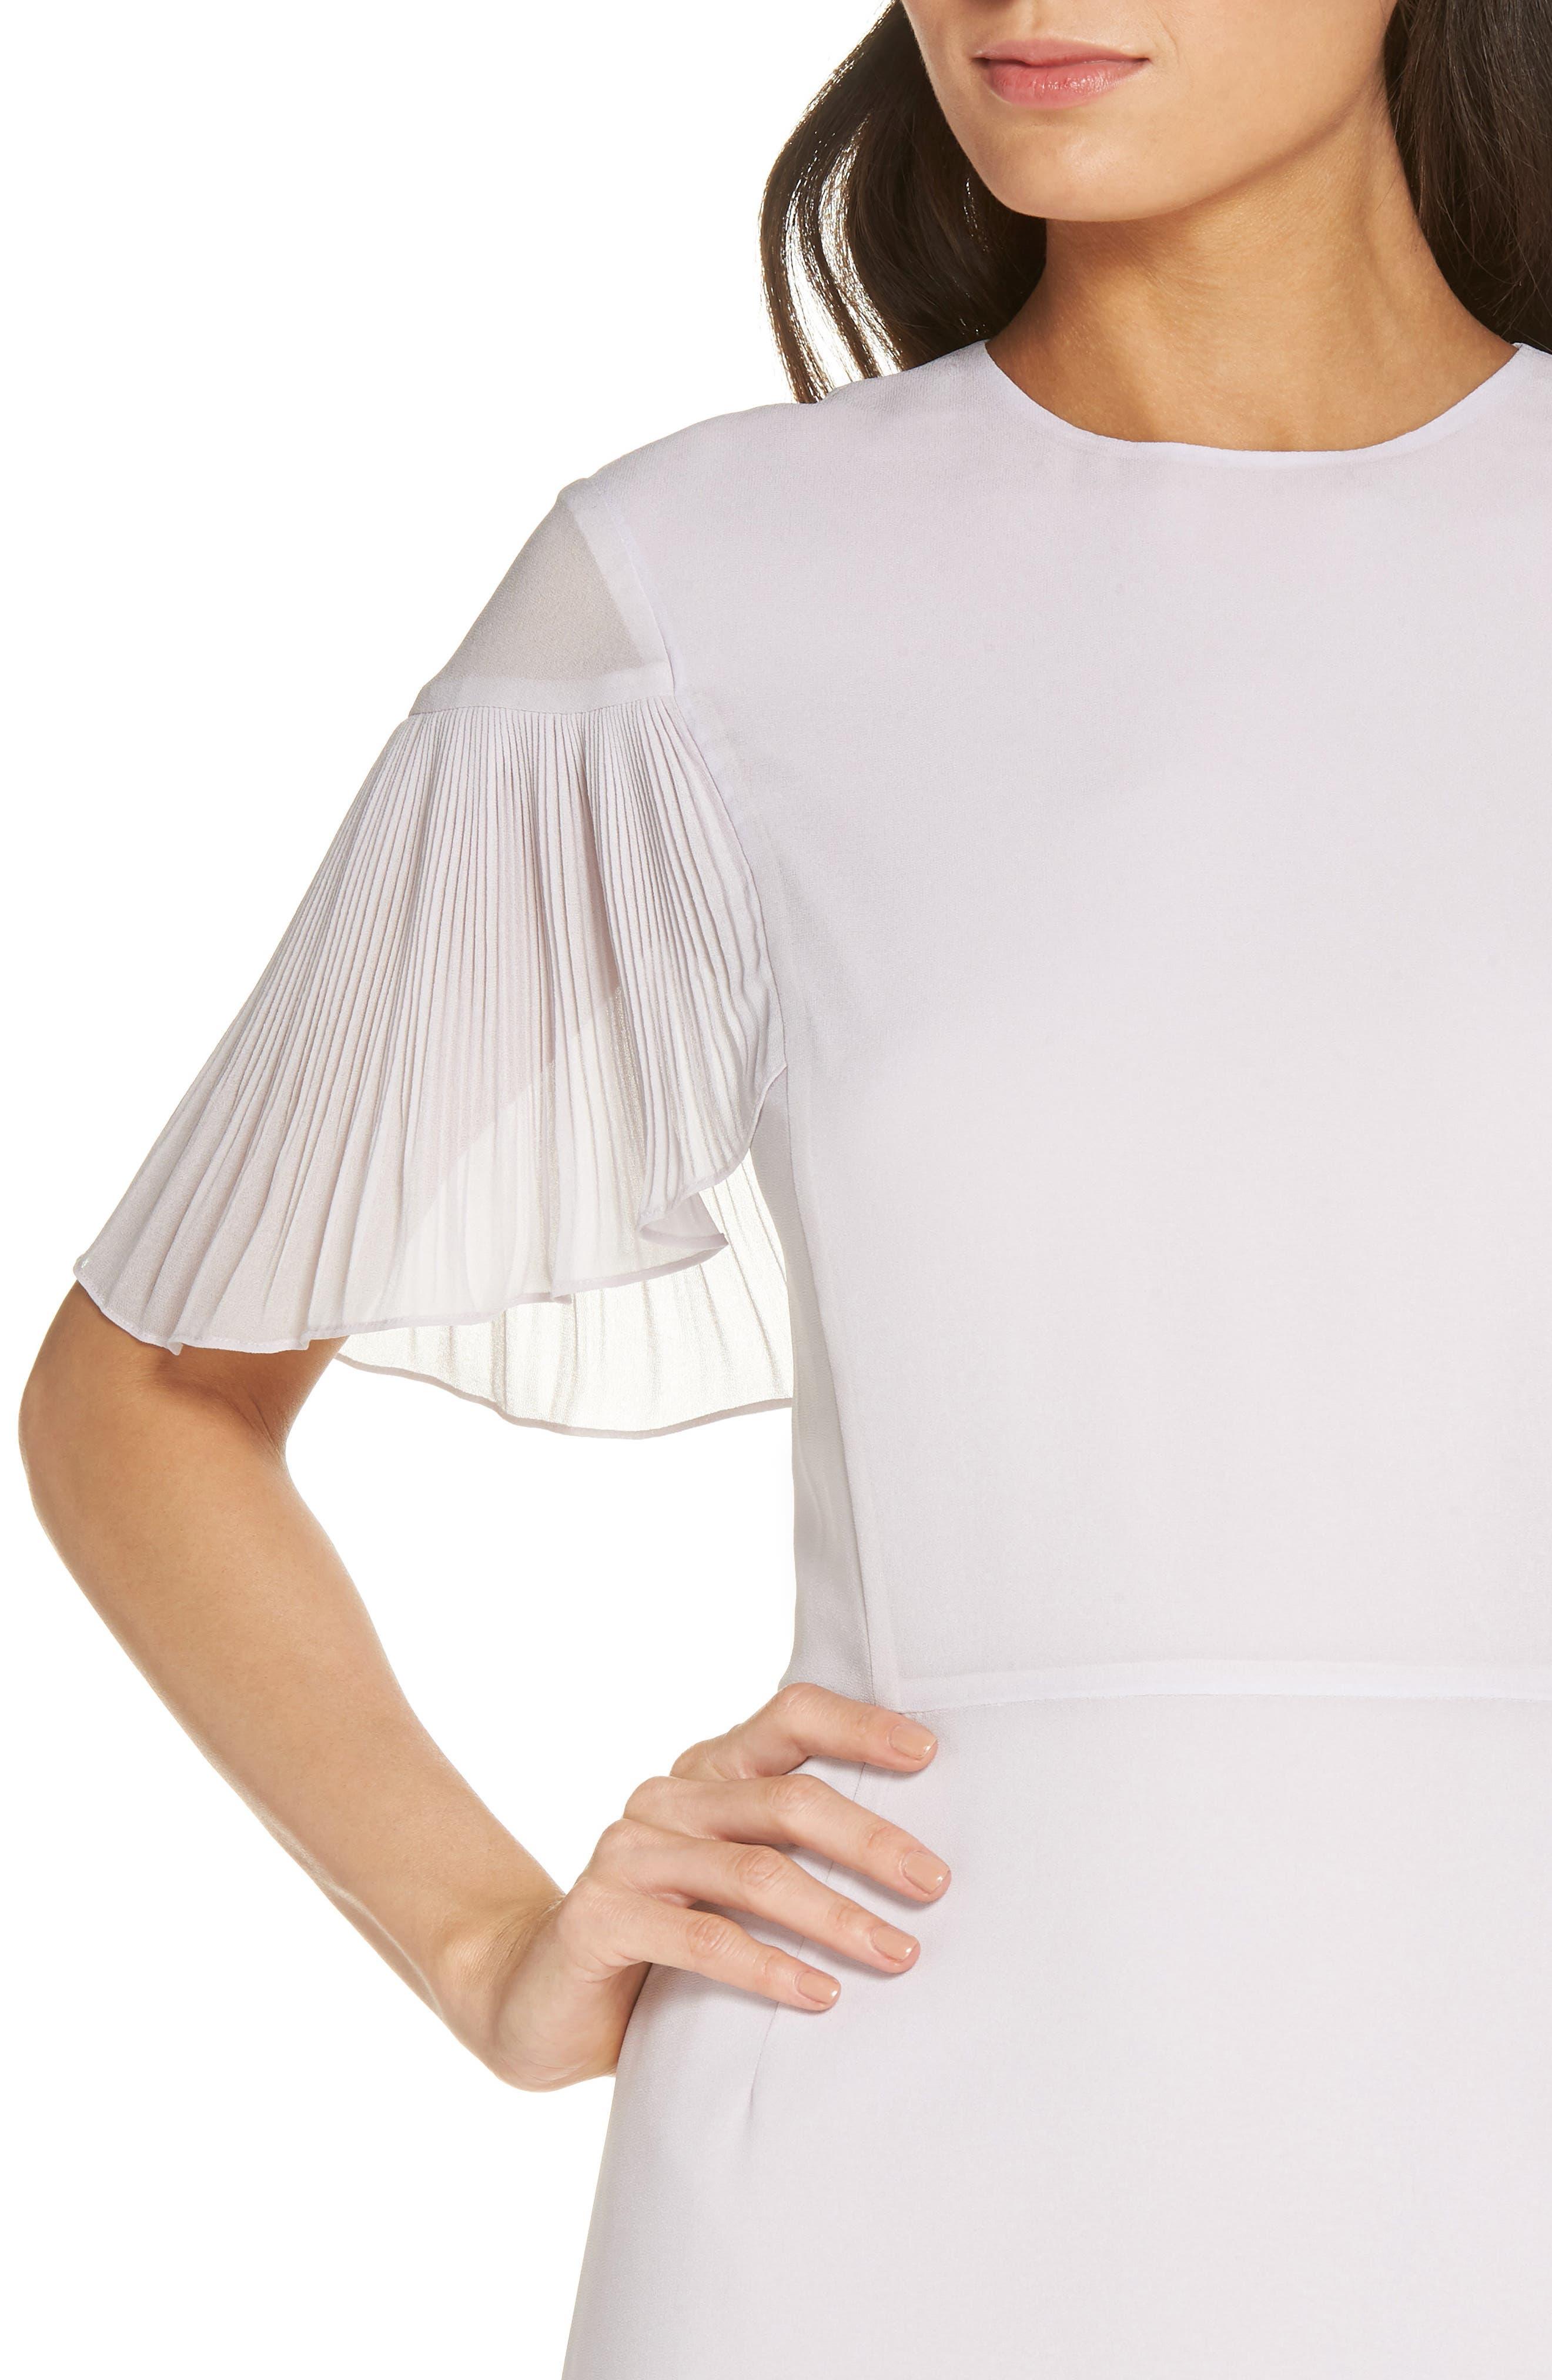 Diana Sheath Dress,                             Alternate thumbnail 4, color,                             580